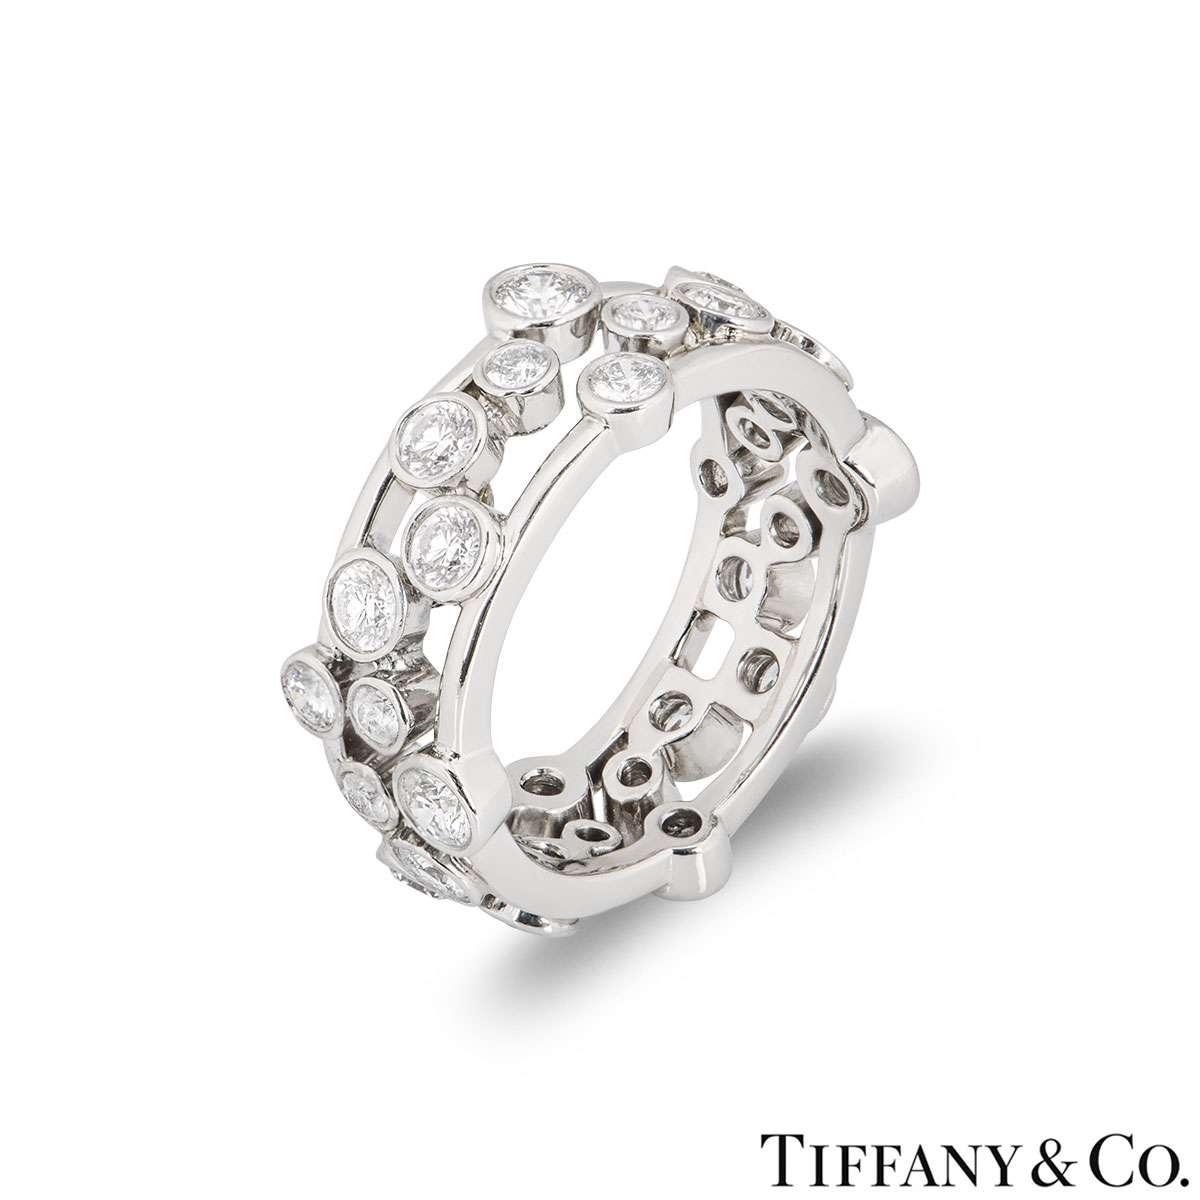 Tiffany & Co. Platinum Diamond Bubble Ring